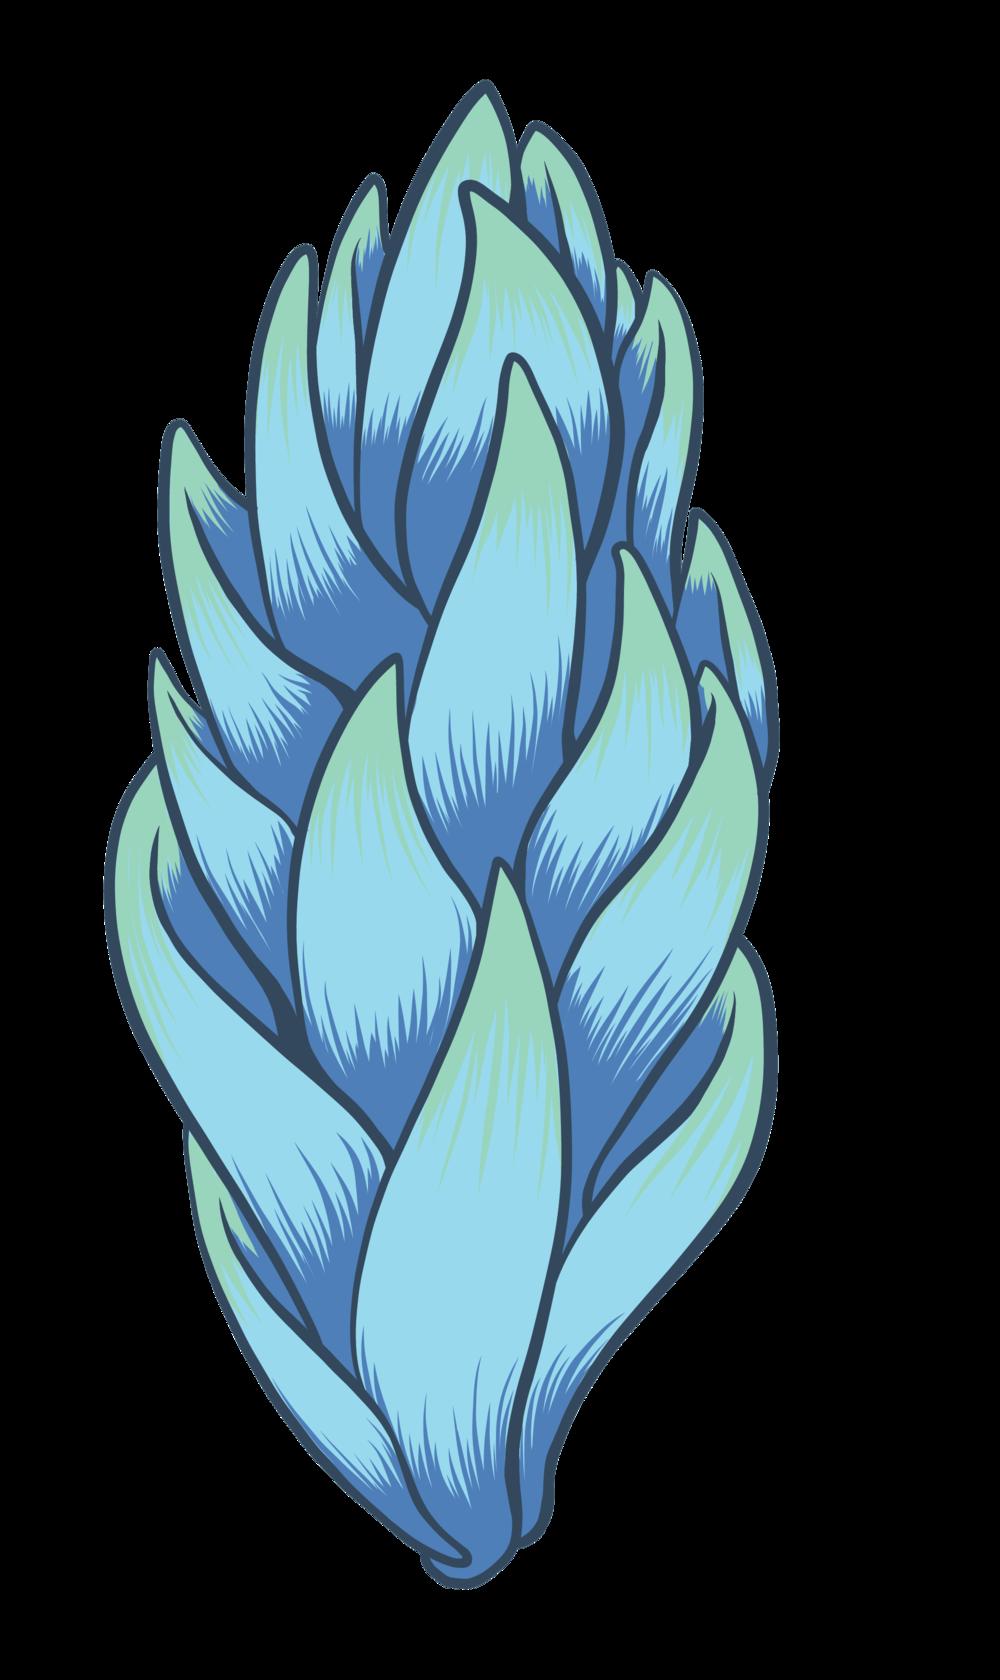 Artboard 1plants.png